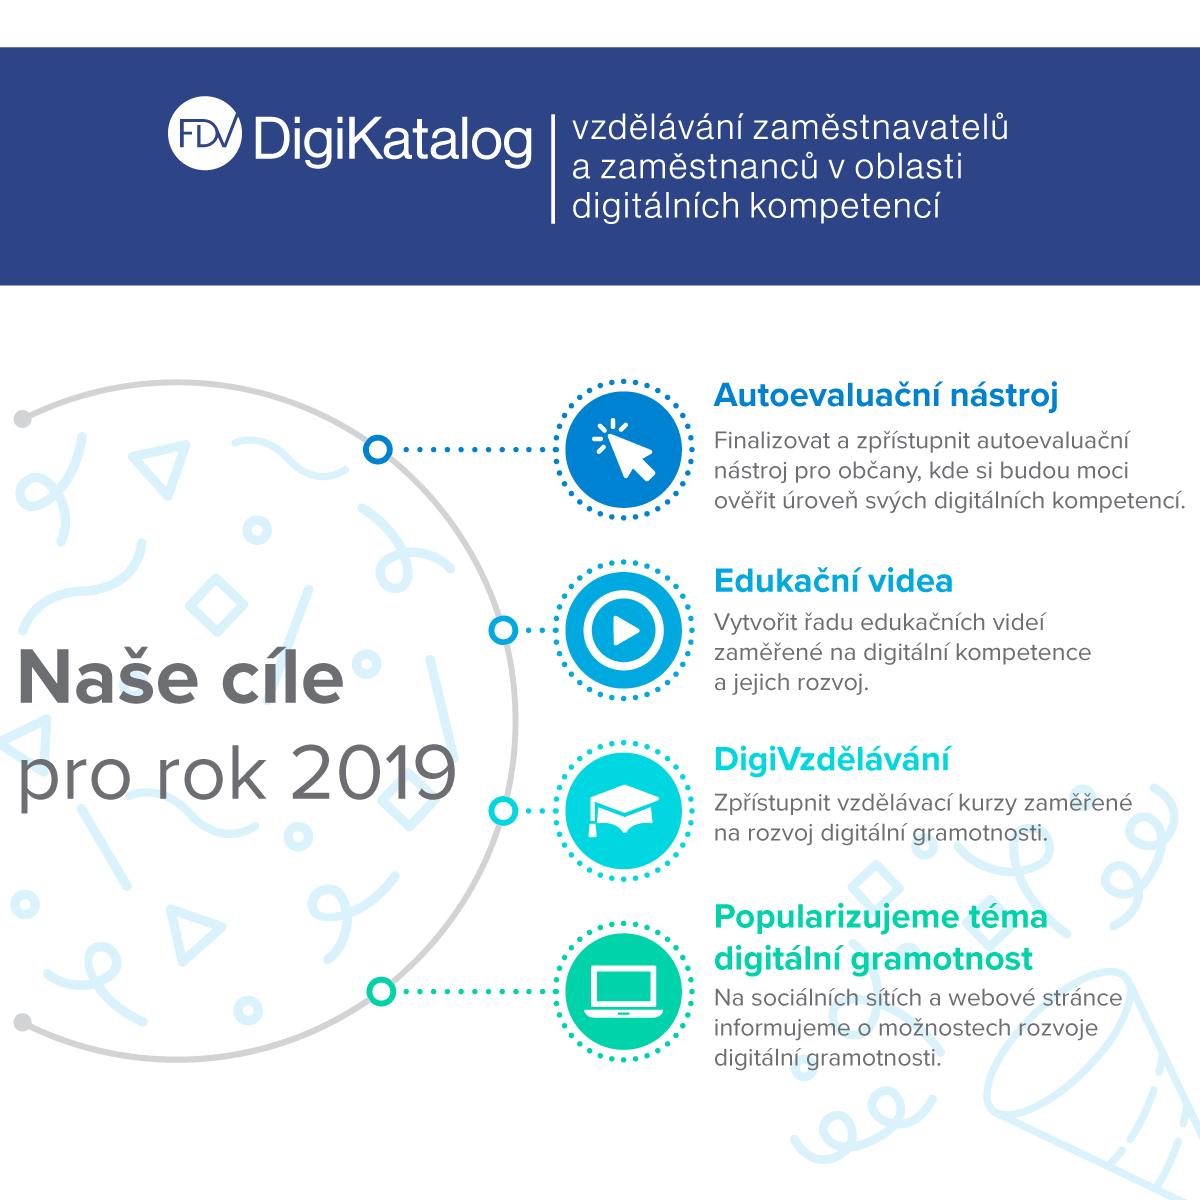 Cile-pro-2019-DigiKatalog.png